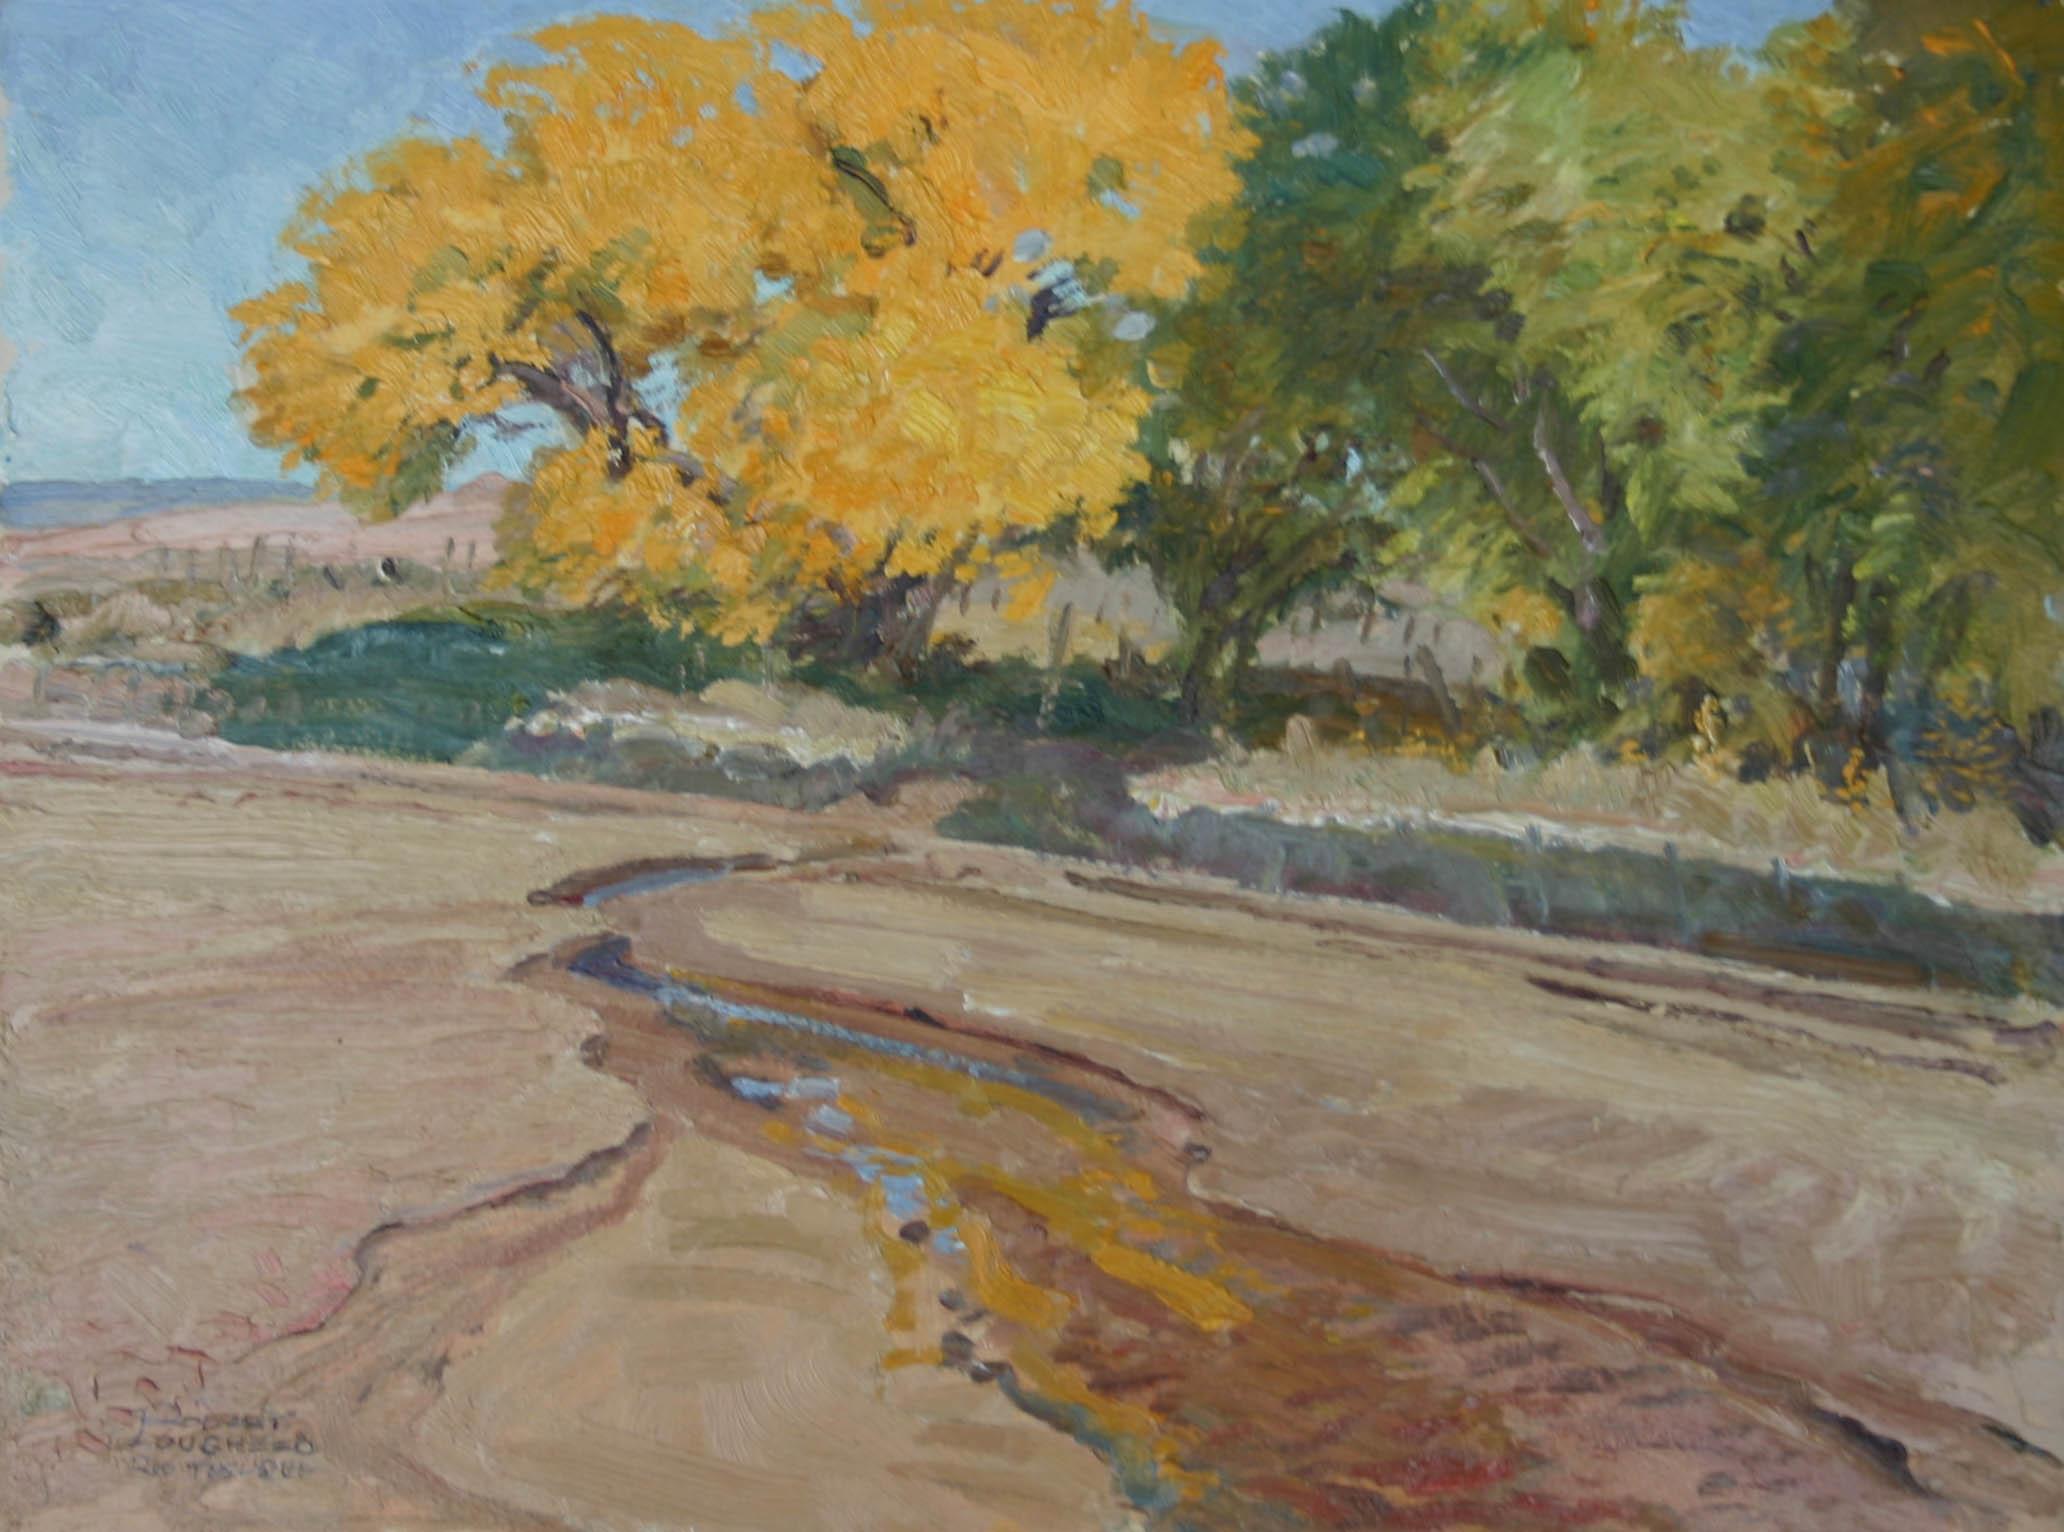 Rio Tesuque by  Robert Lougheed - Masterpiece Online